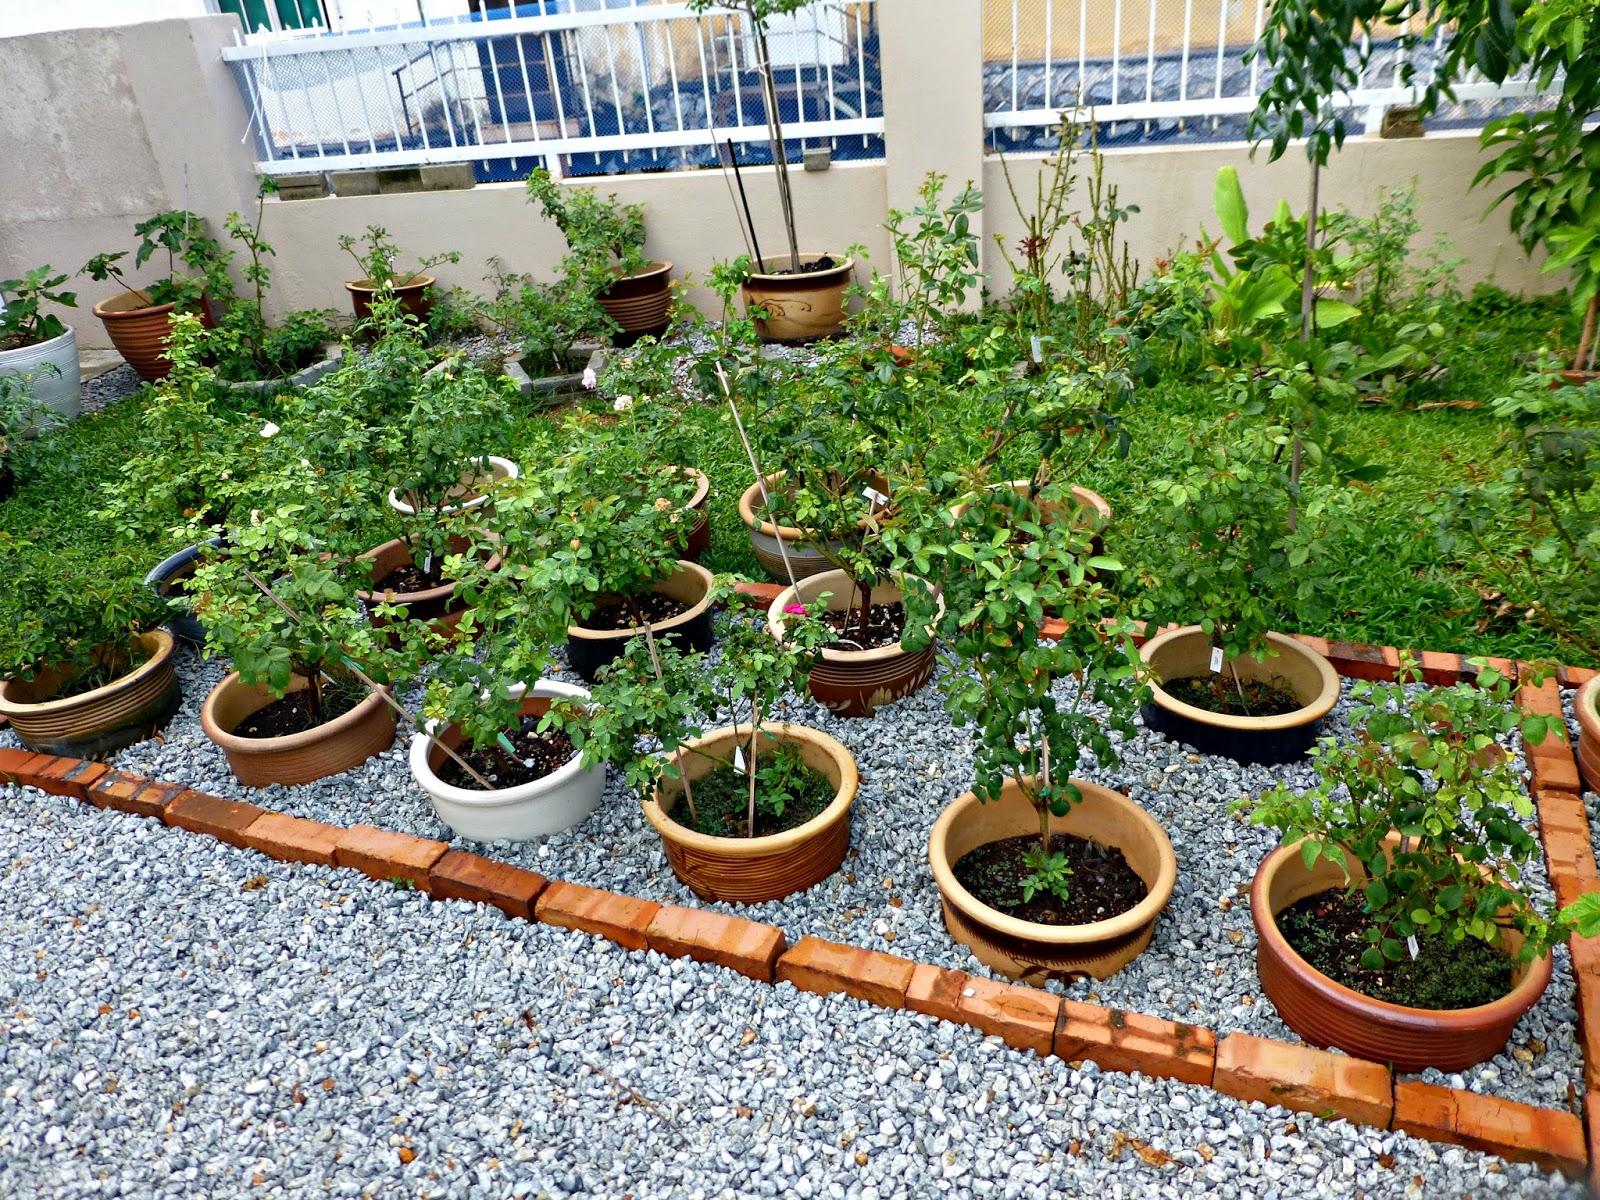 Pokok Ros Di Laman Rumah Saya Alhamdulillah Ni Suami Yang Tolong Tanam Ke Tanah Selepas 2 Minggu Semakin